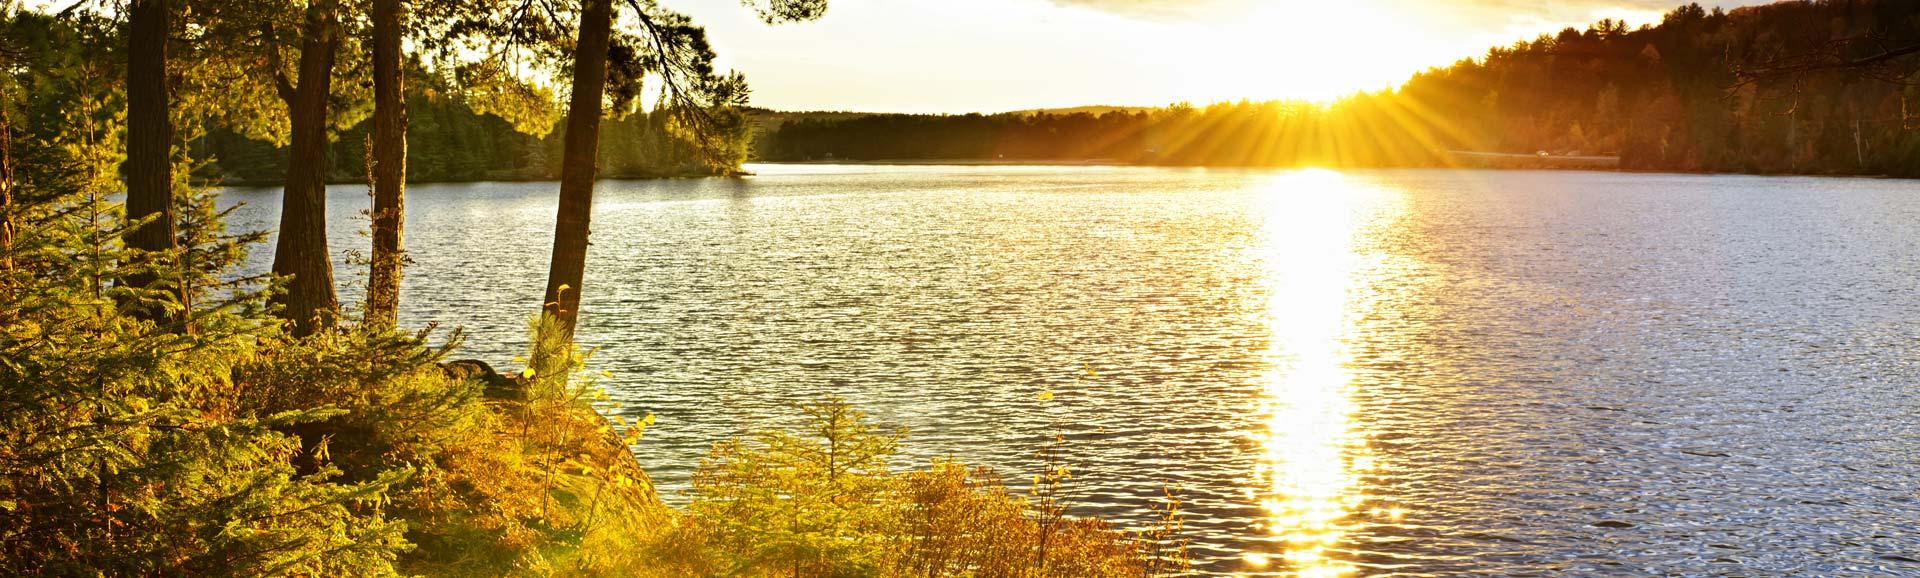 Sonnenuntergang am Ontariosee, Kanada.